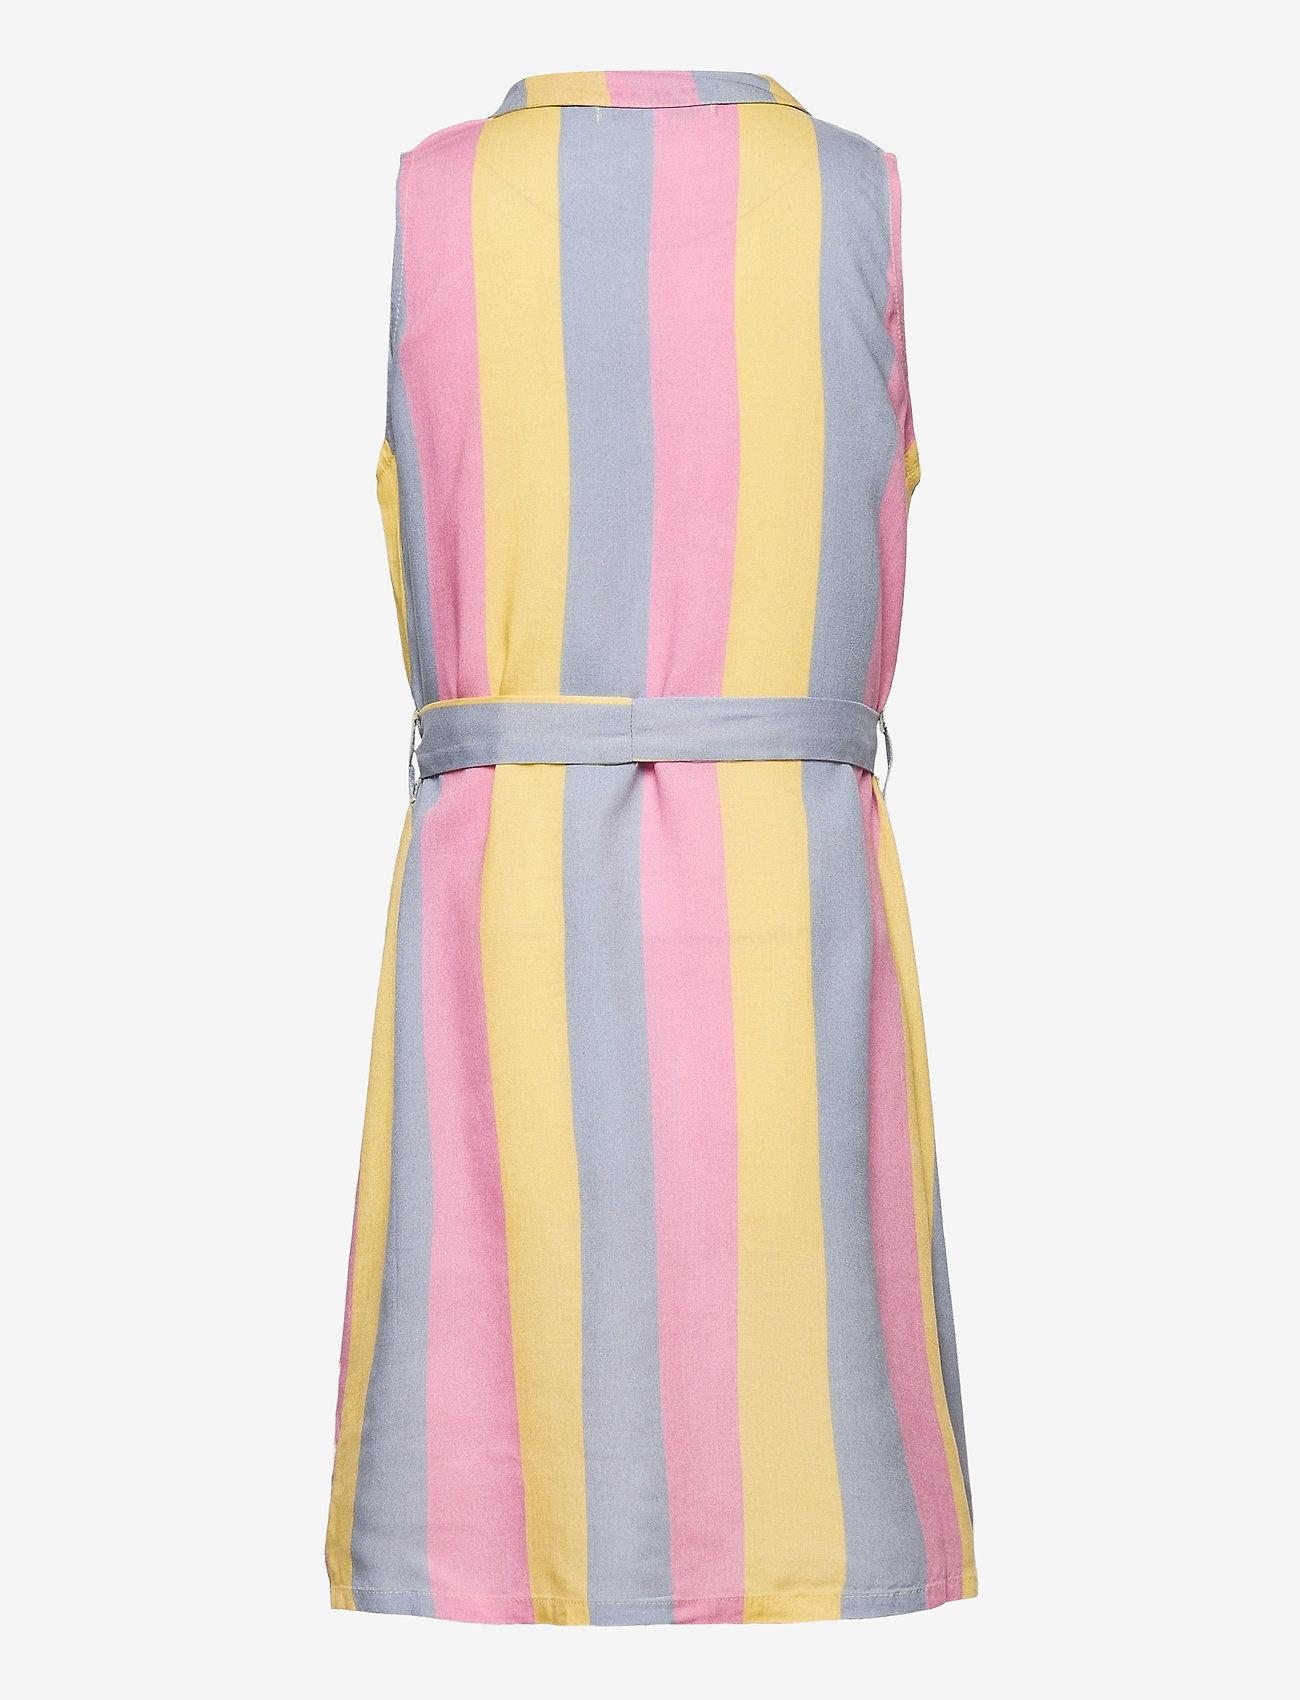 Costbart - NINNA SL DRESS - kleider - dusty blue - 1